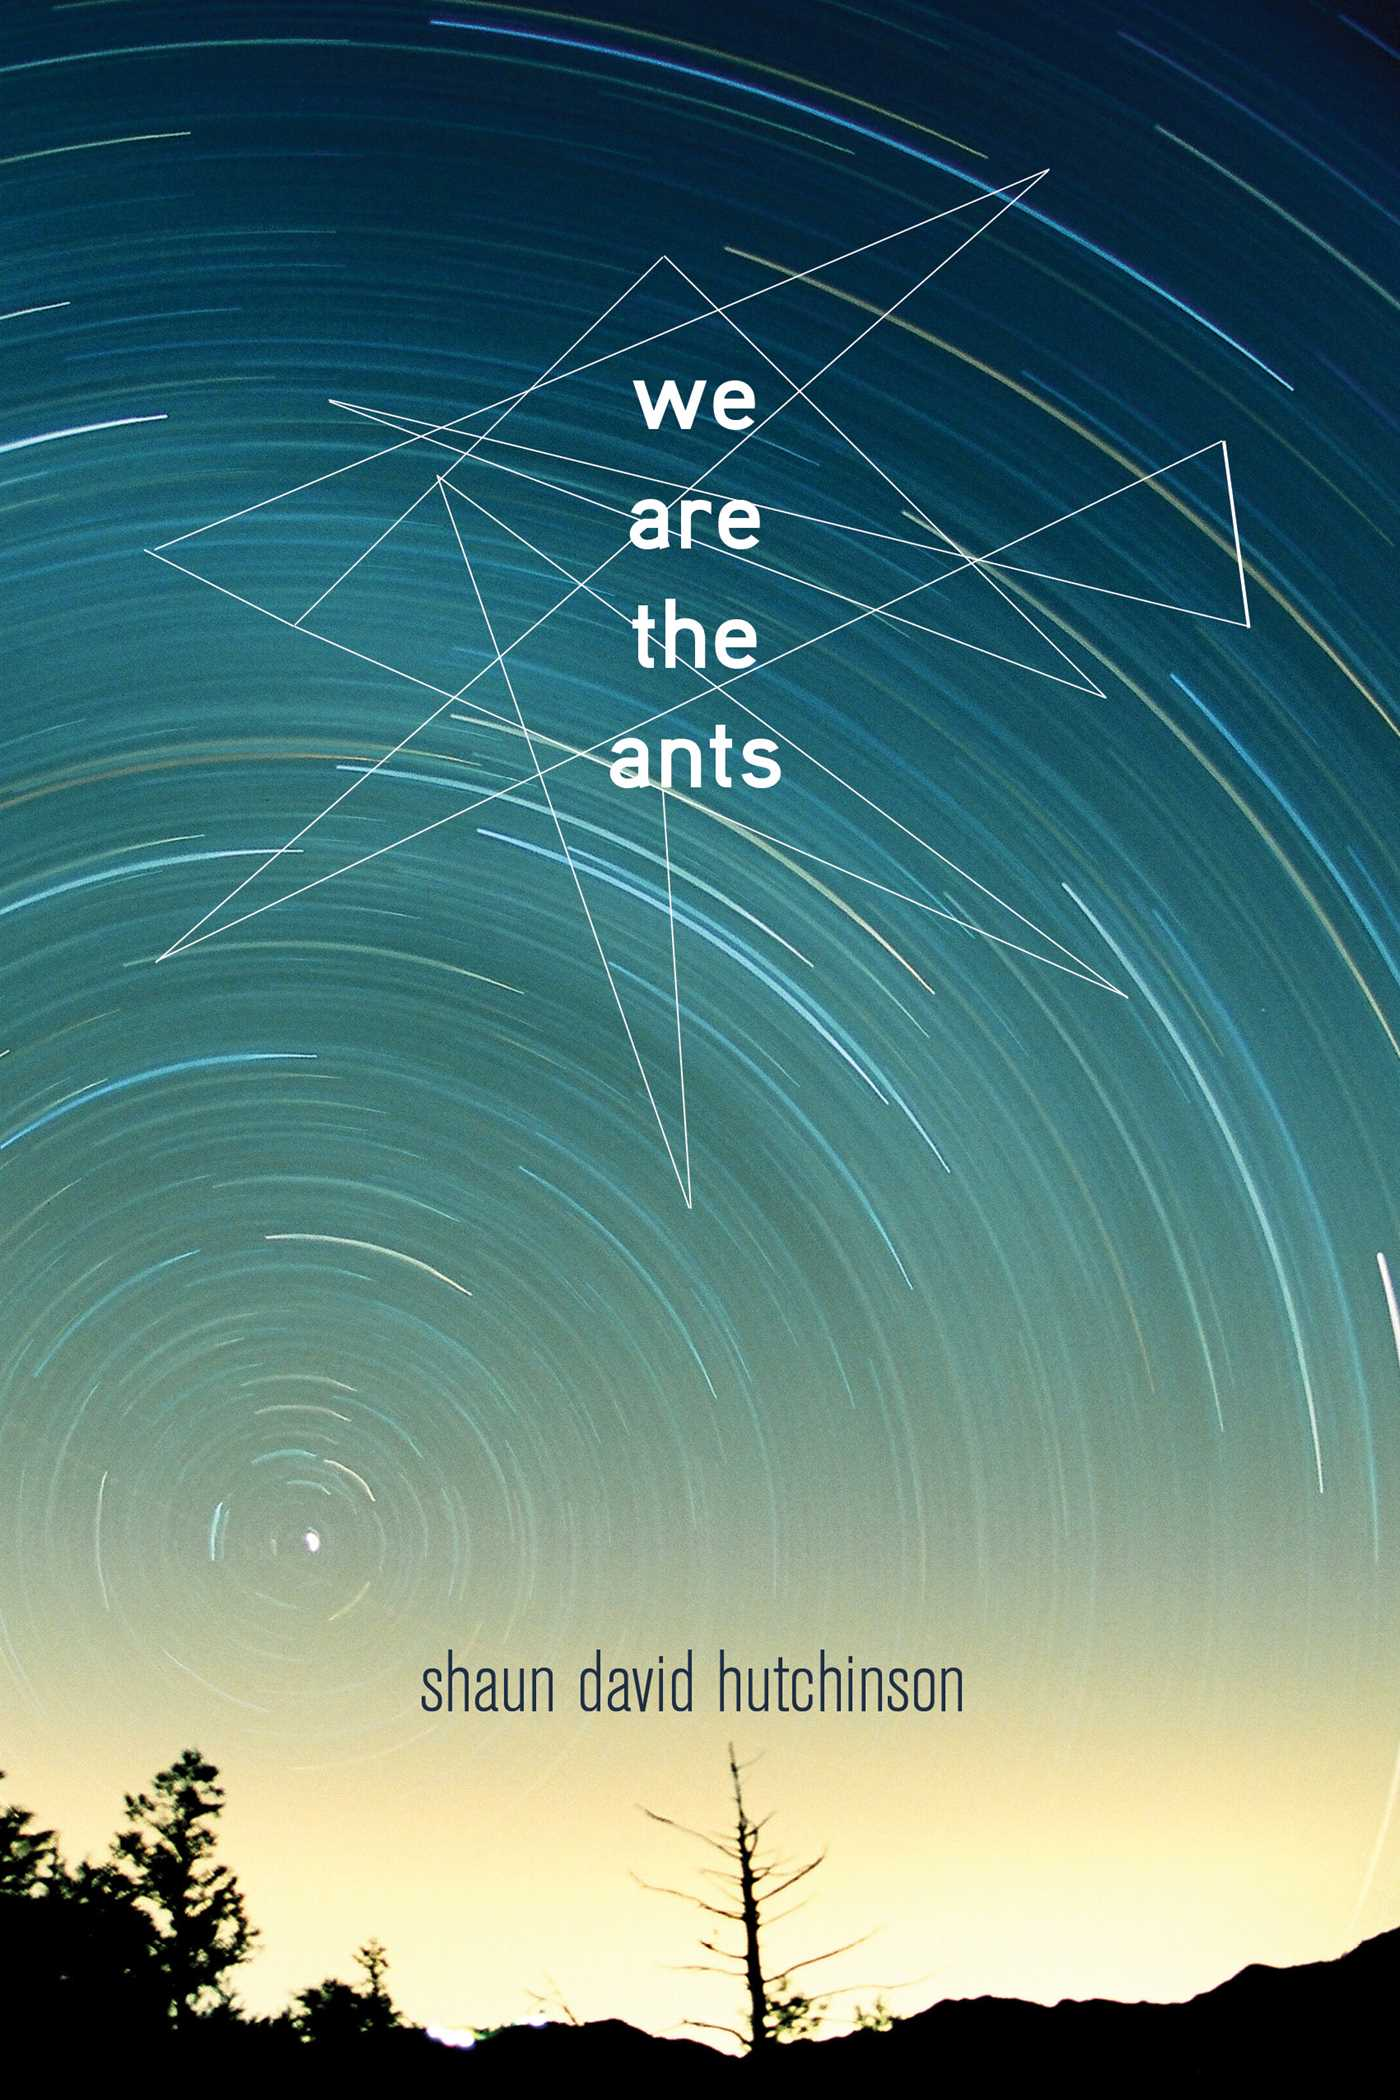 shaun-david-hutchinson-we-are-the-ants.jpg